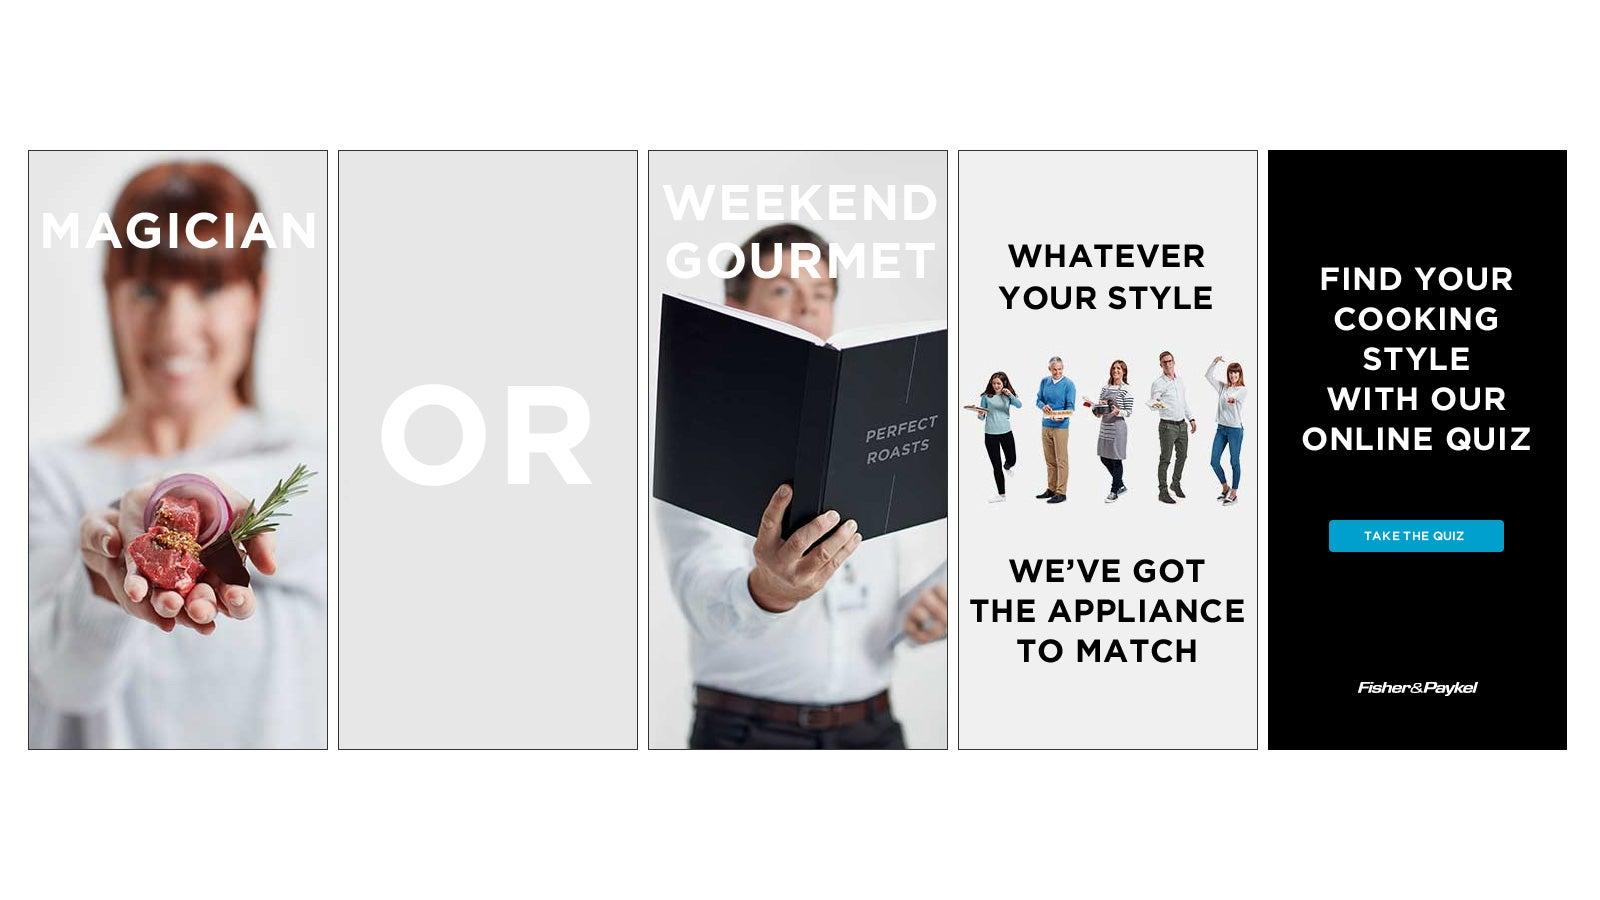 Fisher & Paykel | online display advertisement image gallery | Devotion